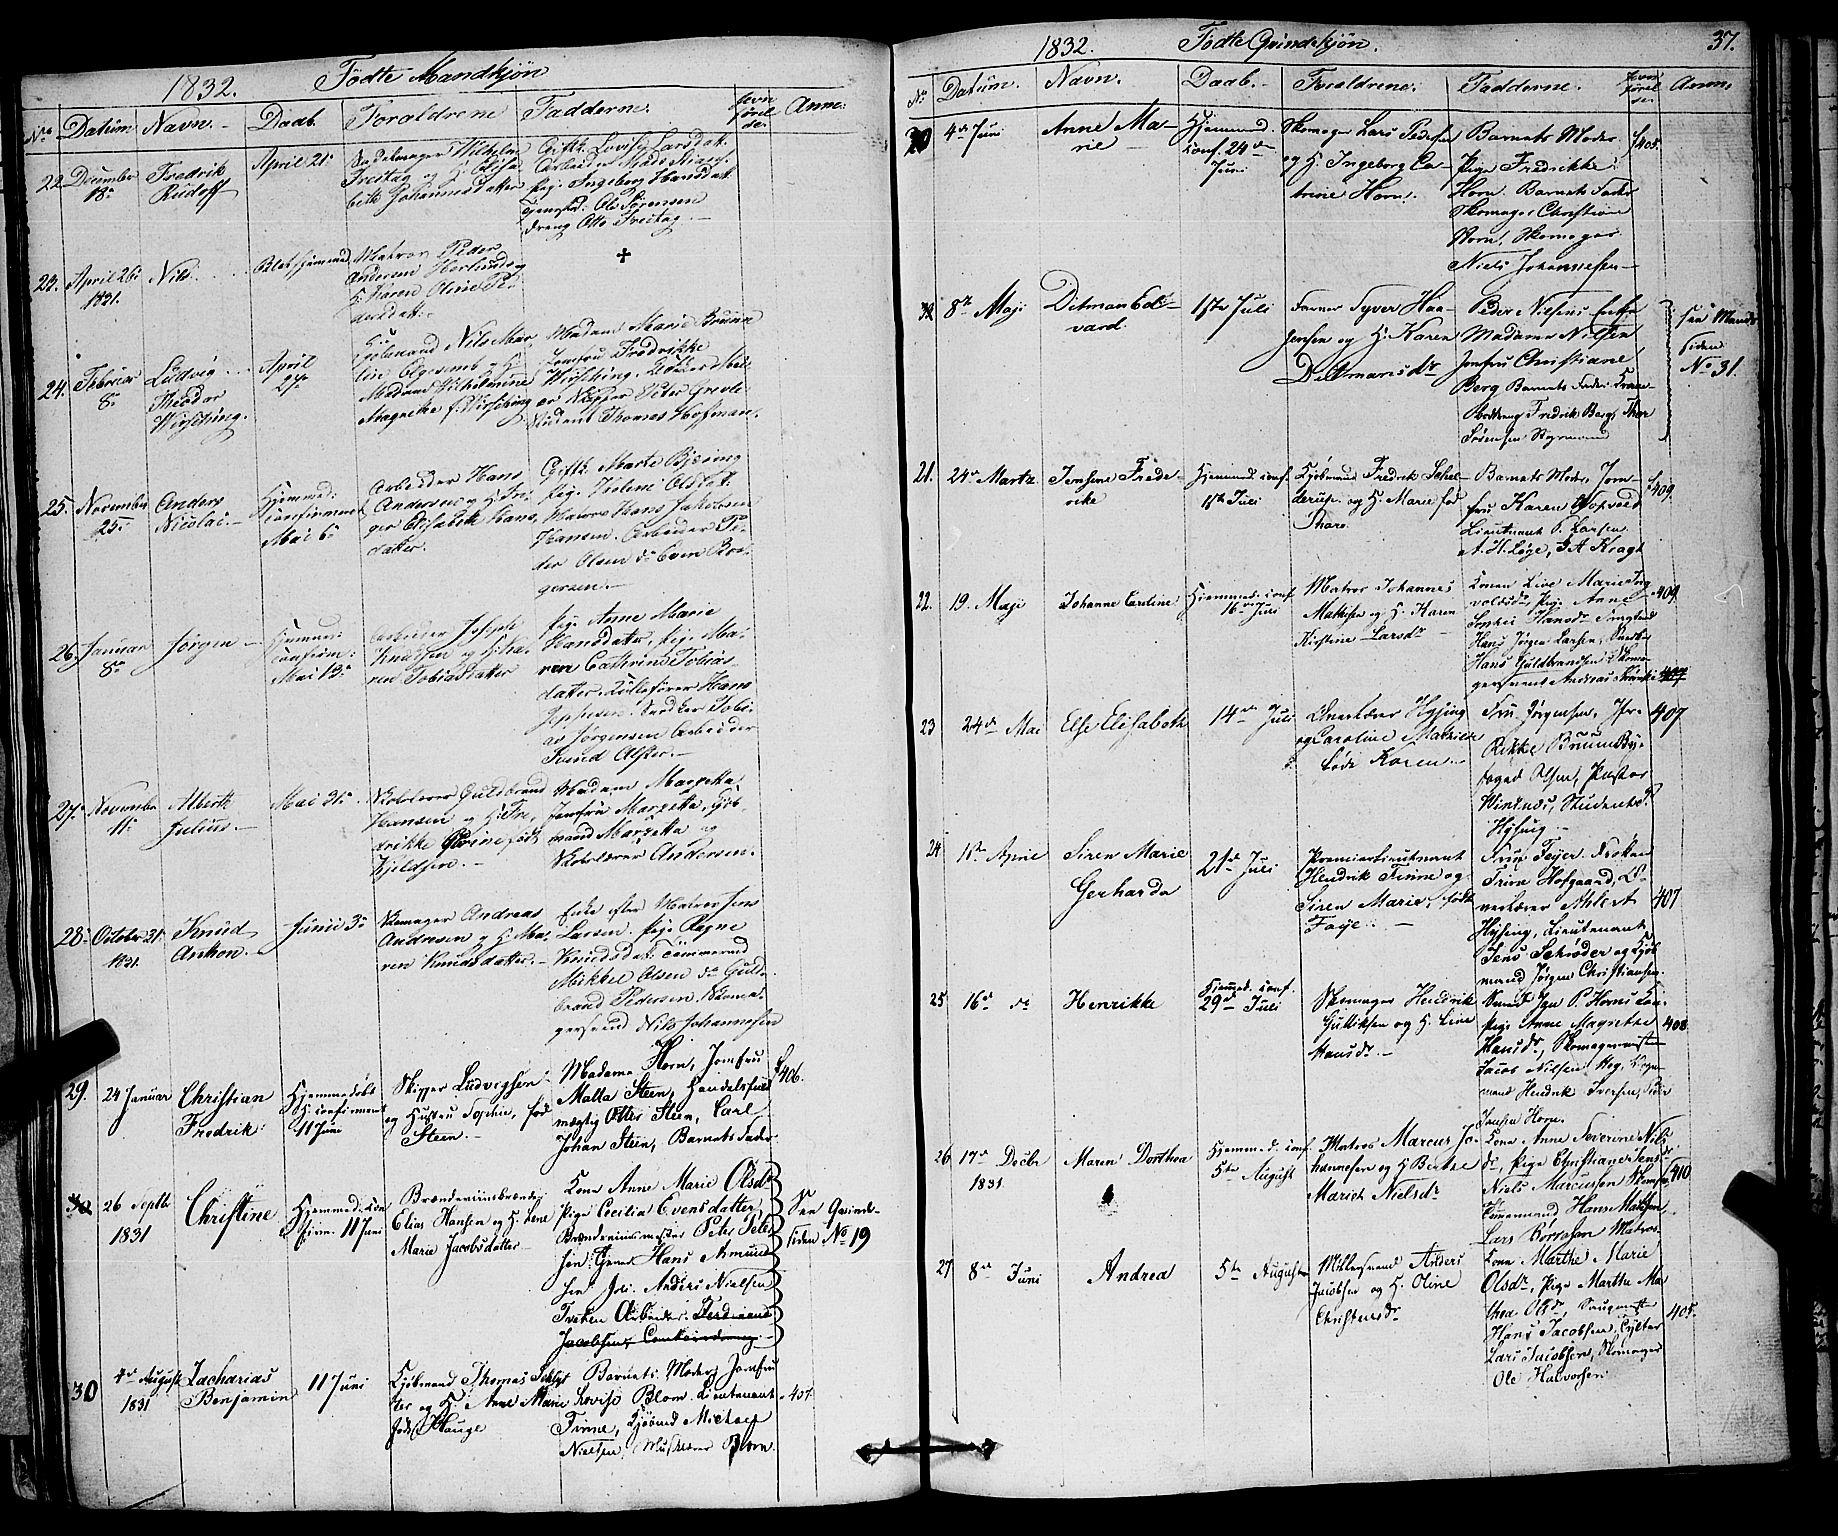 SAKO, Larvik kirkebøker, F/Fa/L0002: Ministerialbok nr. I 2, 1825-1847, s. 37